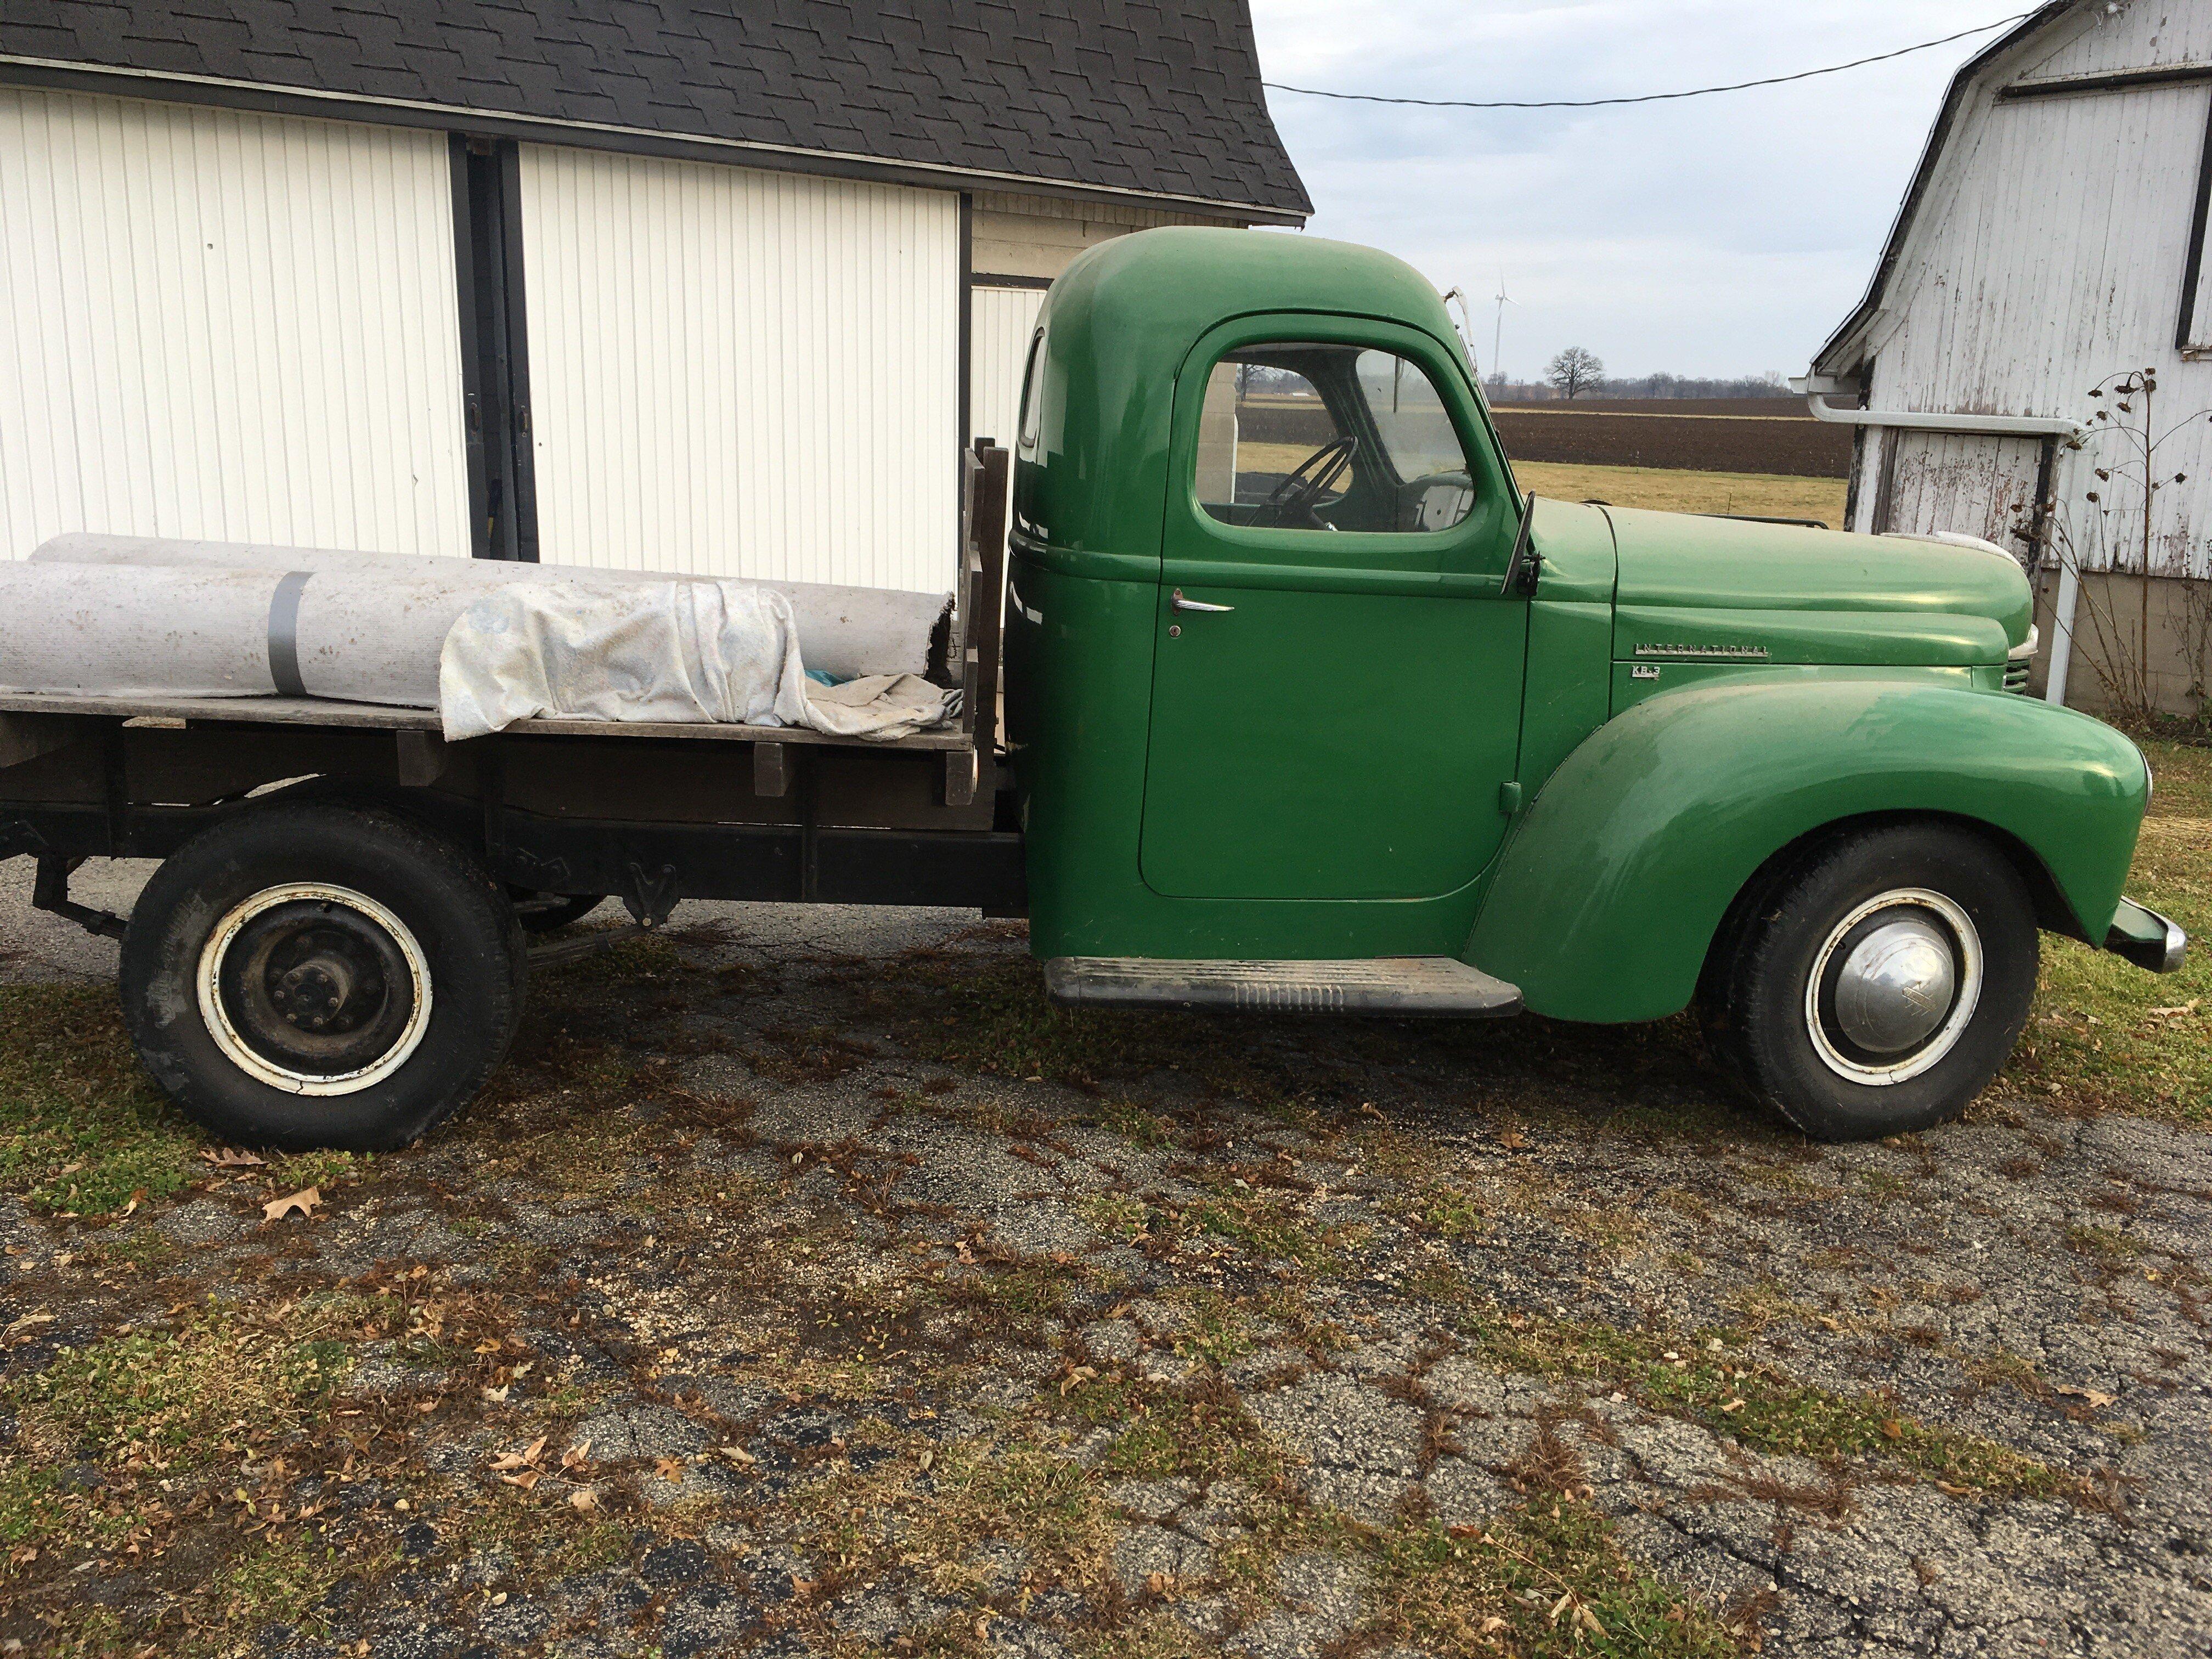 1946 International Harvester Truck Wiring Harness Electrical Kb 3 For Sale Near Eden Wisconsin Old Trucks